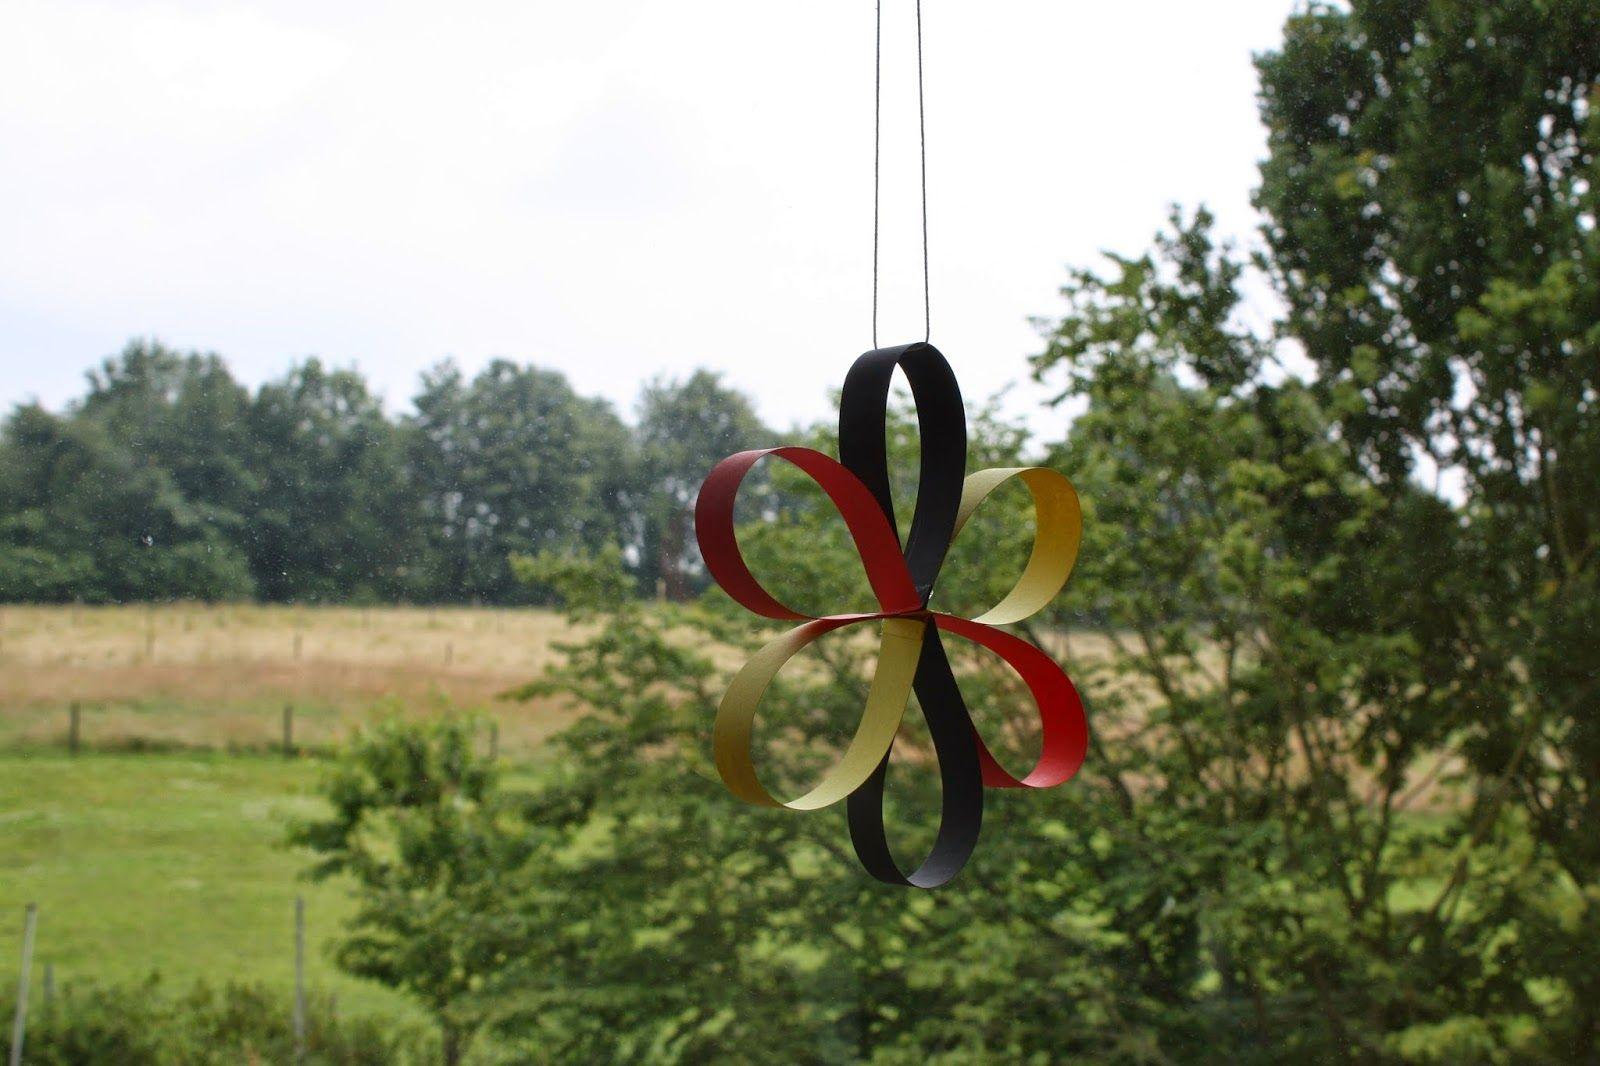 Materialwerkstatt fensterdeko f r den sommer blumen aus papierstreifen basteln fr hling - Fensterdeko sommer ...